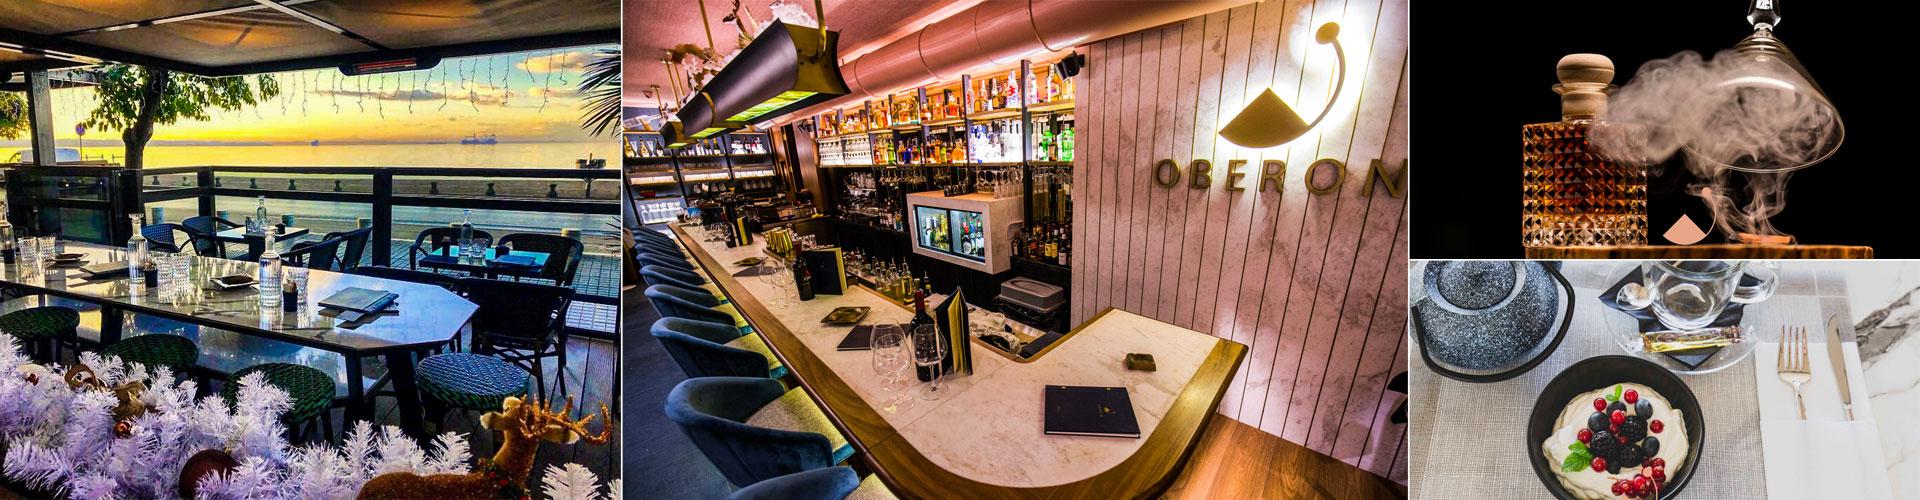 Oberon Bar Restaurant Θεσσαλονίκη